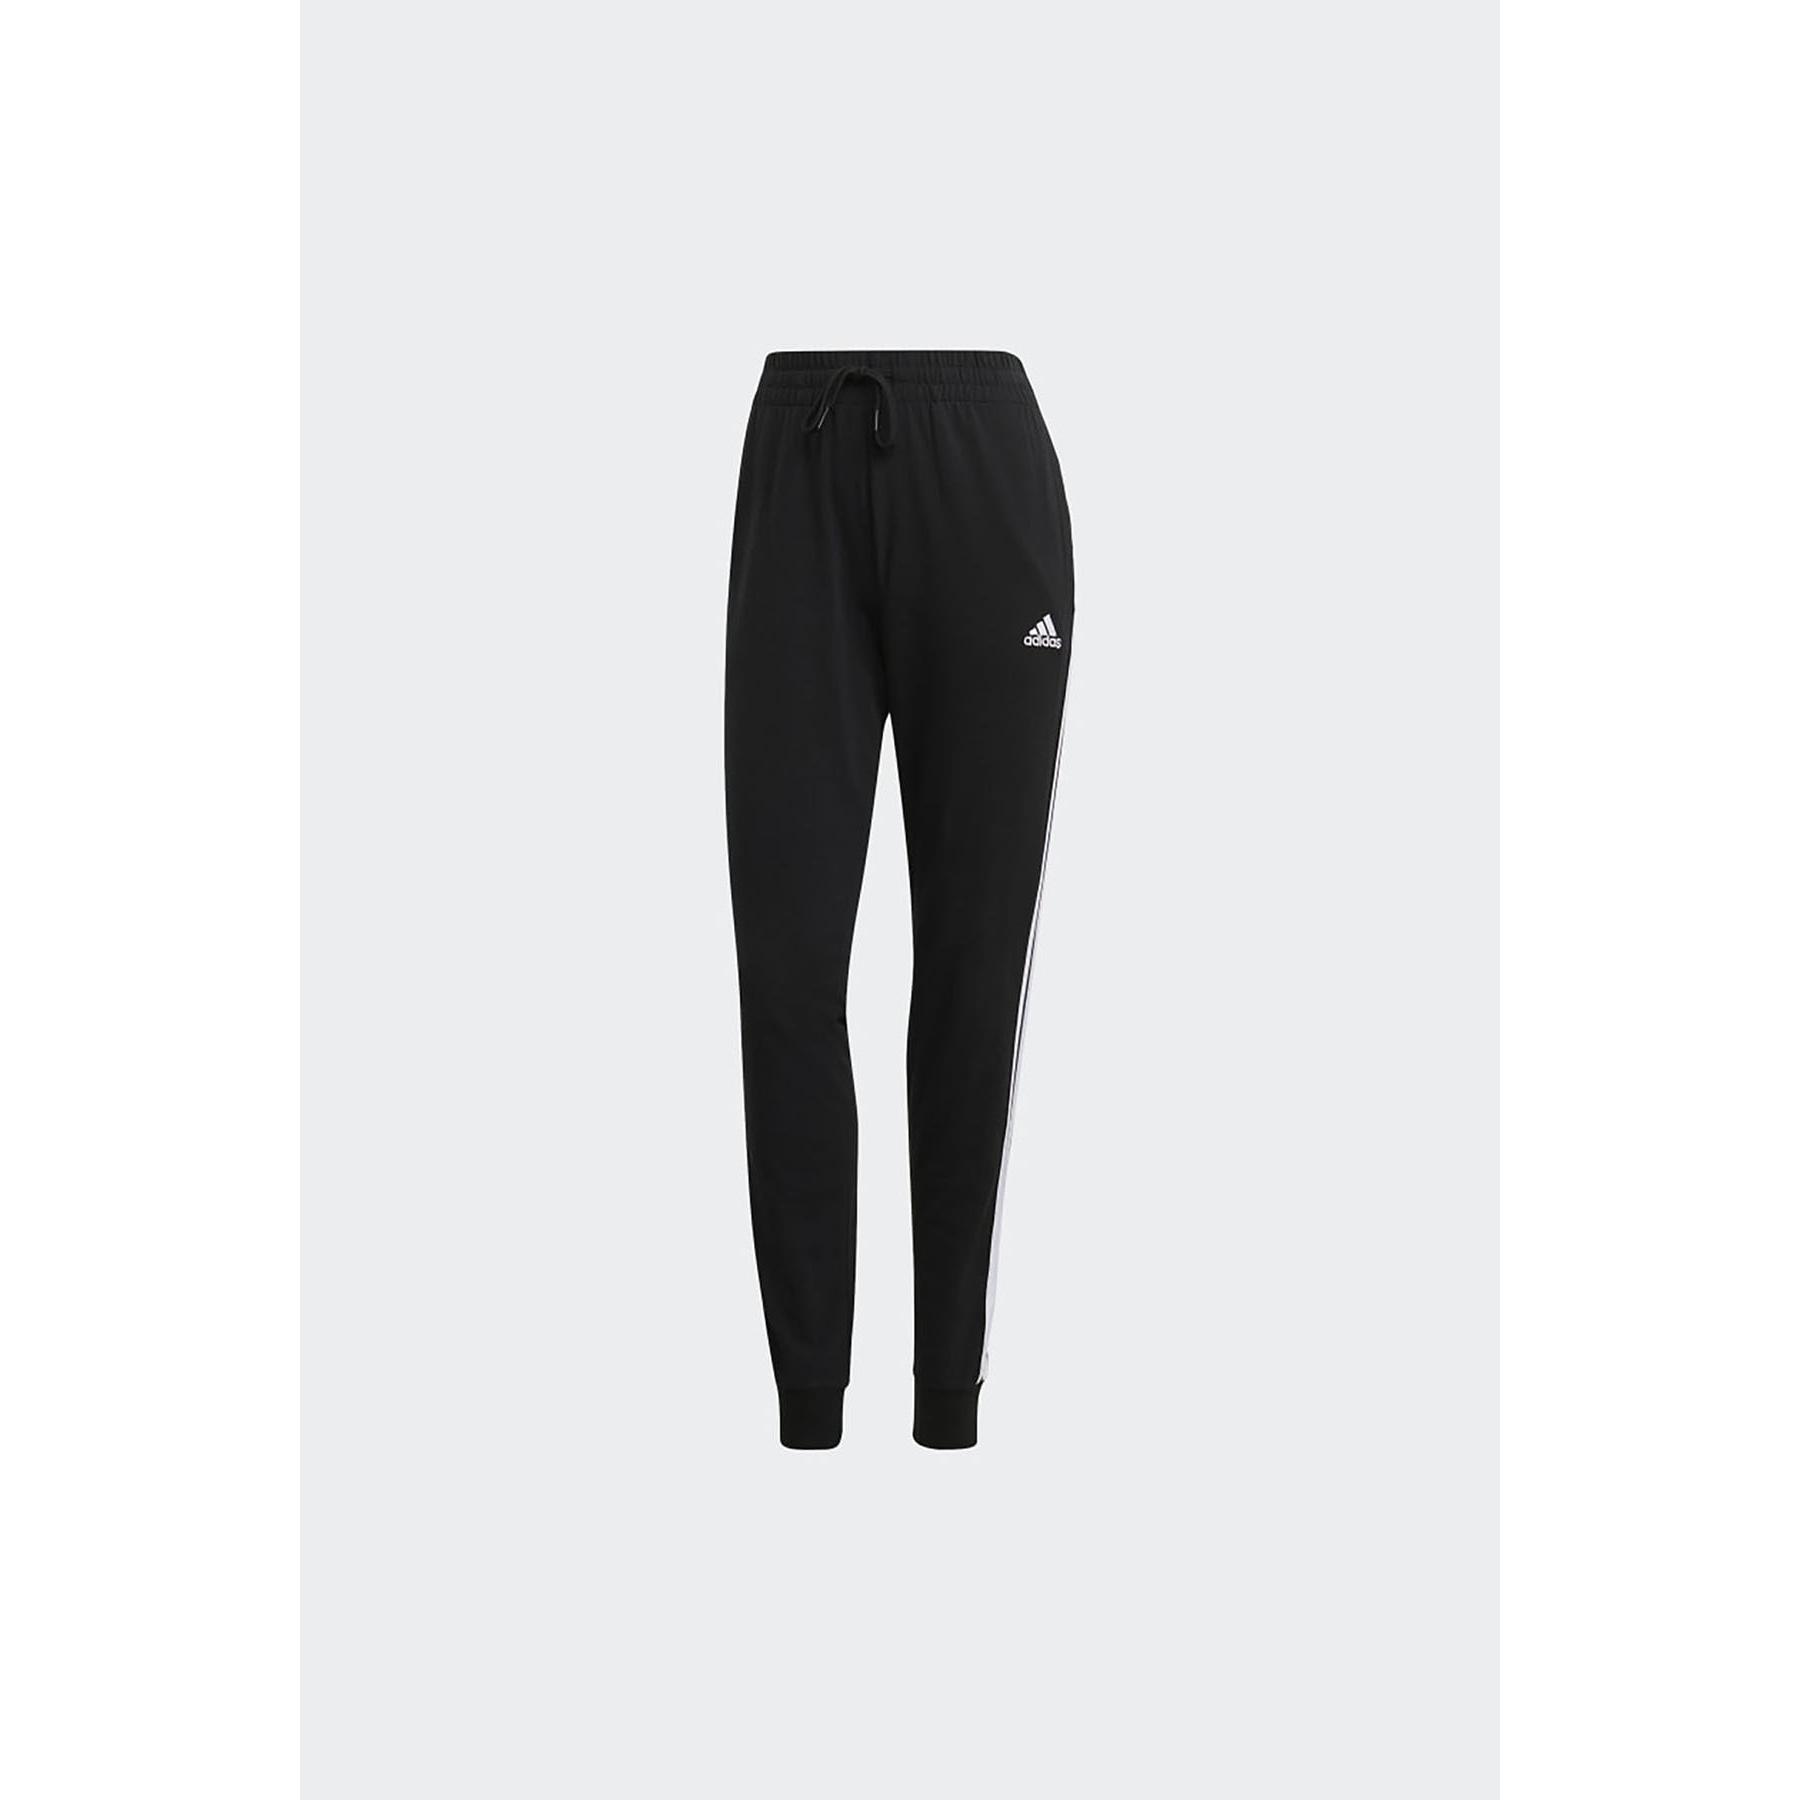 Essentials Single Jersey 3-Stripes Kadın Siyah Eşofman Altı (GM5542)